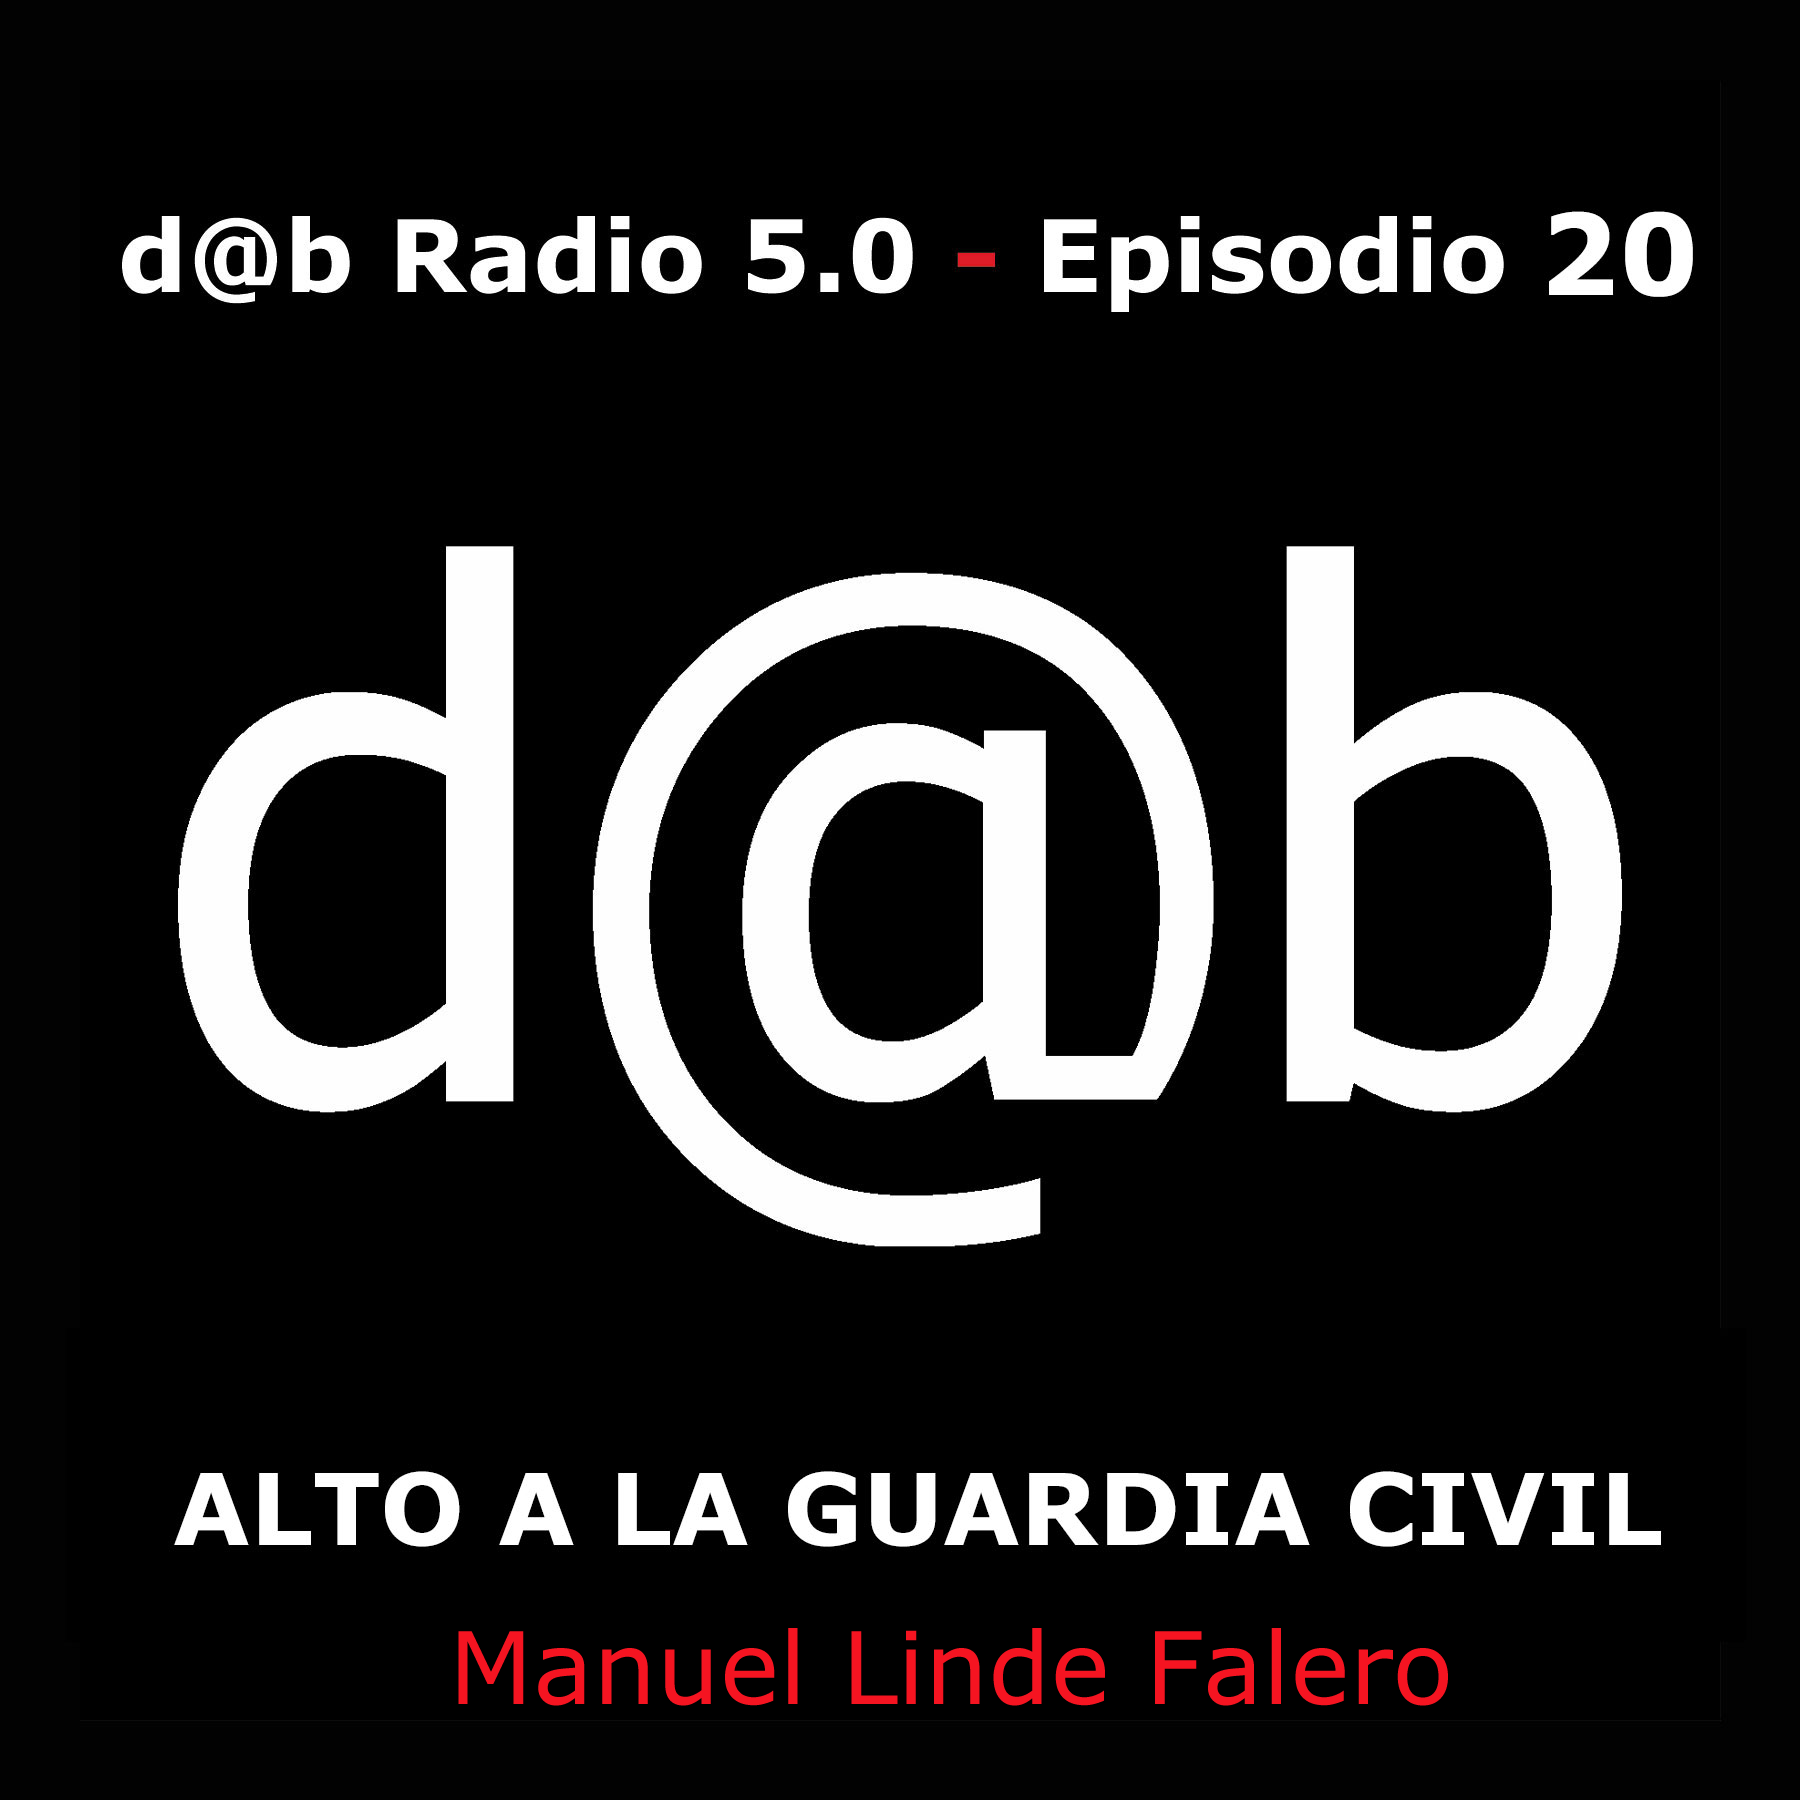 Desmontando a Babylon: d@b radio 5.0 Episodio 20 – Alto a la Guardia Civil. Manuel Linde Falero